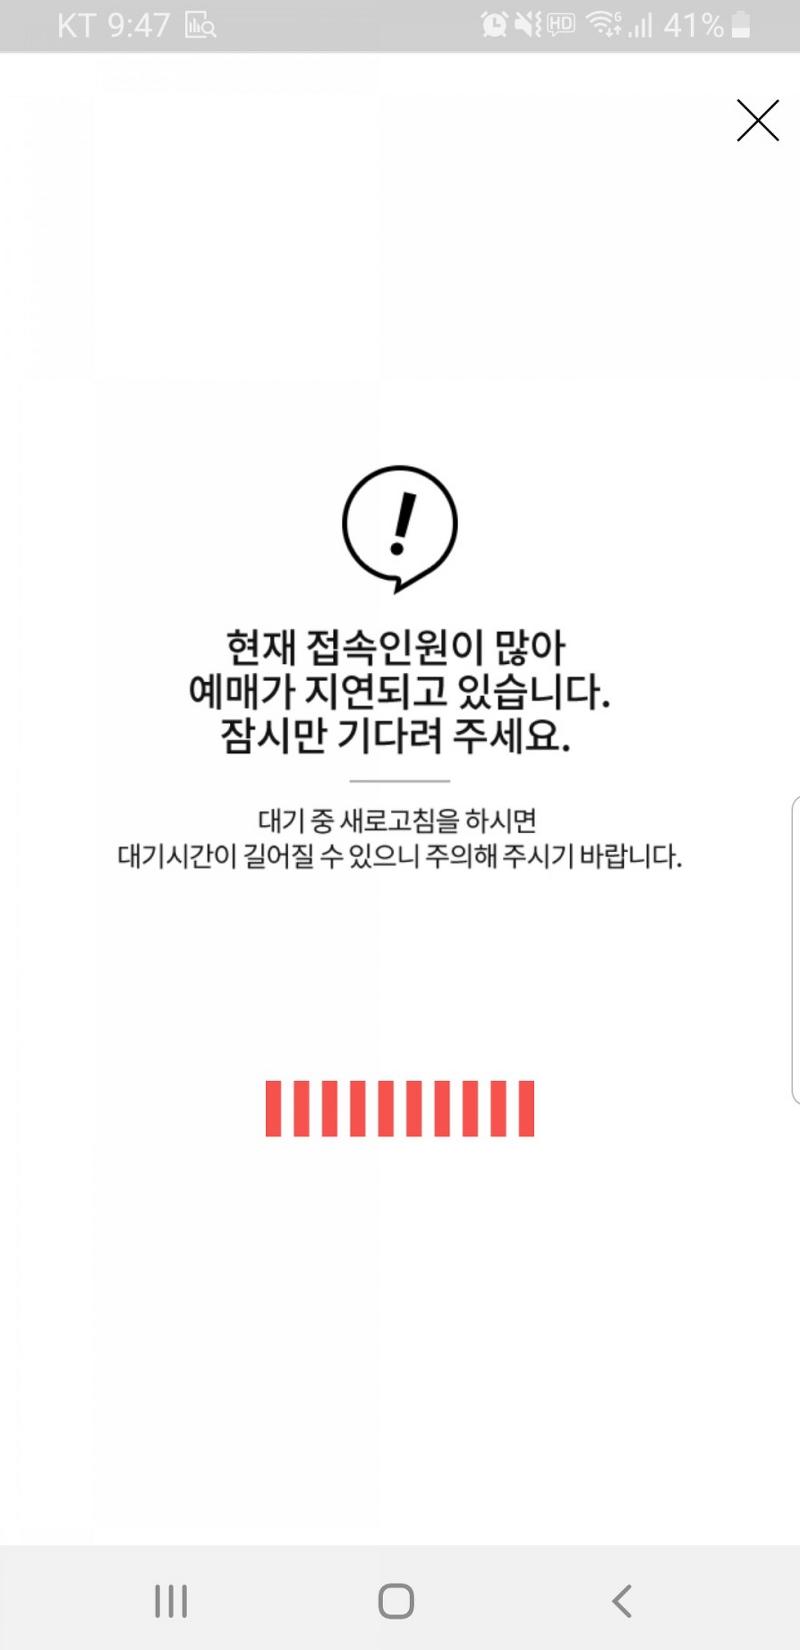 BTS 맵솔 티켓팅 후기